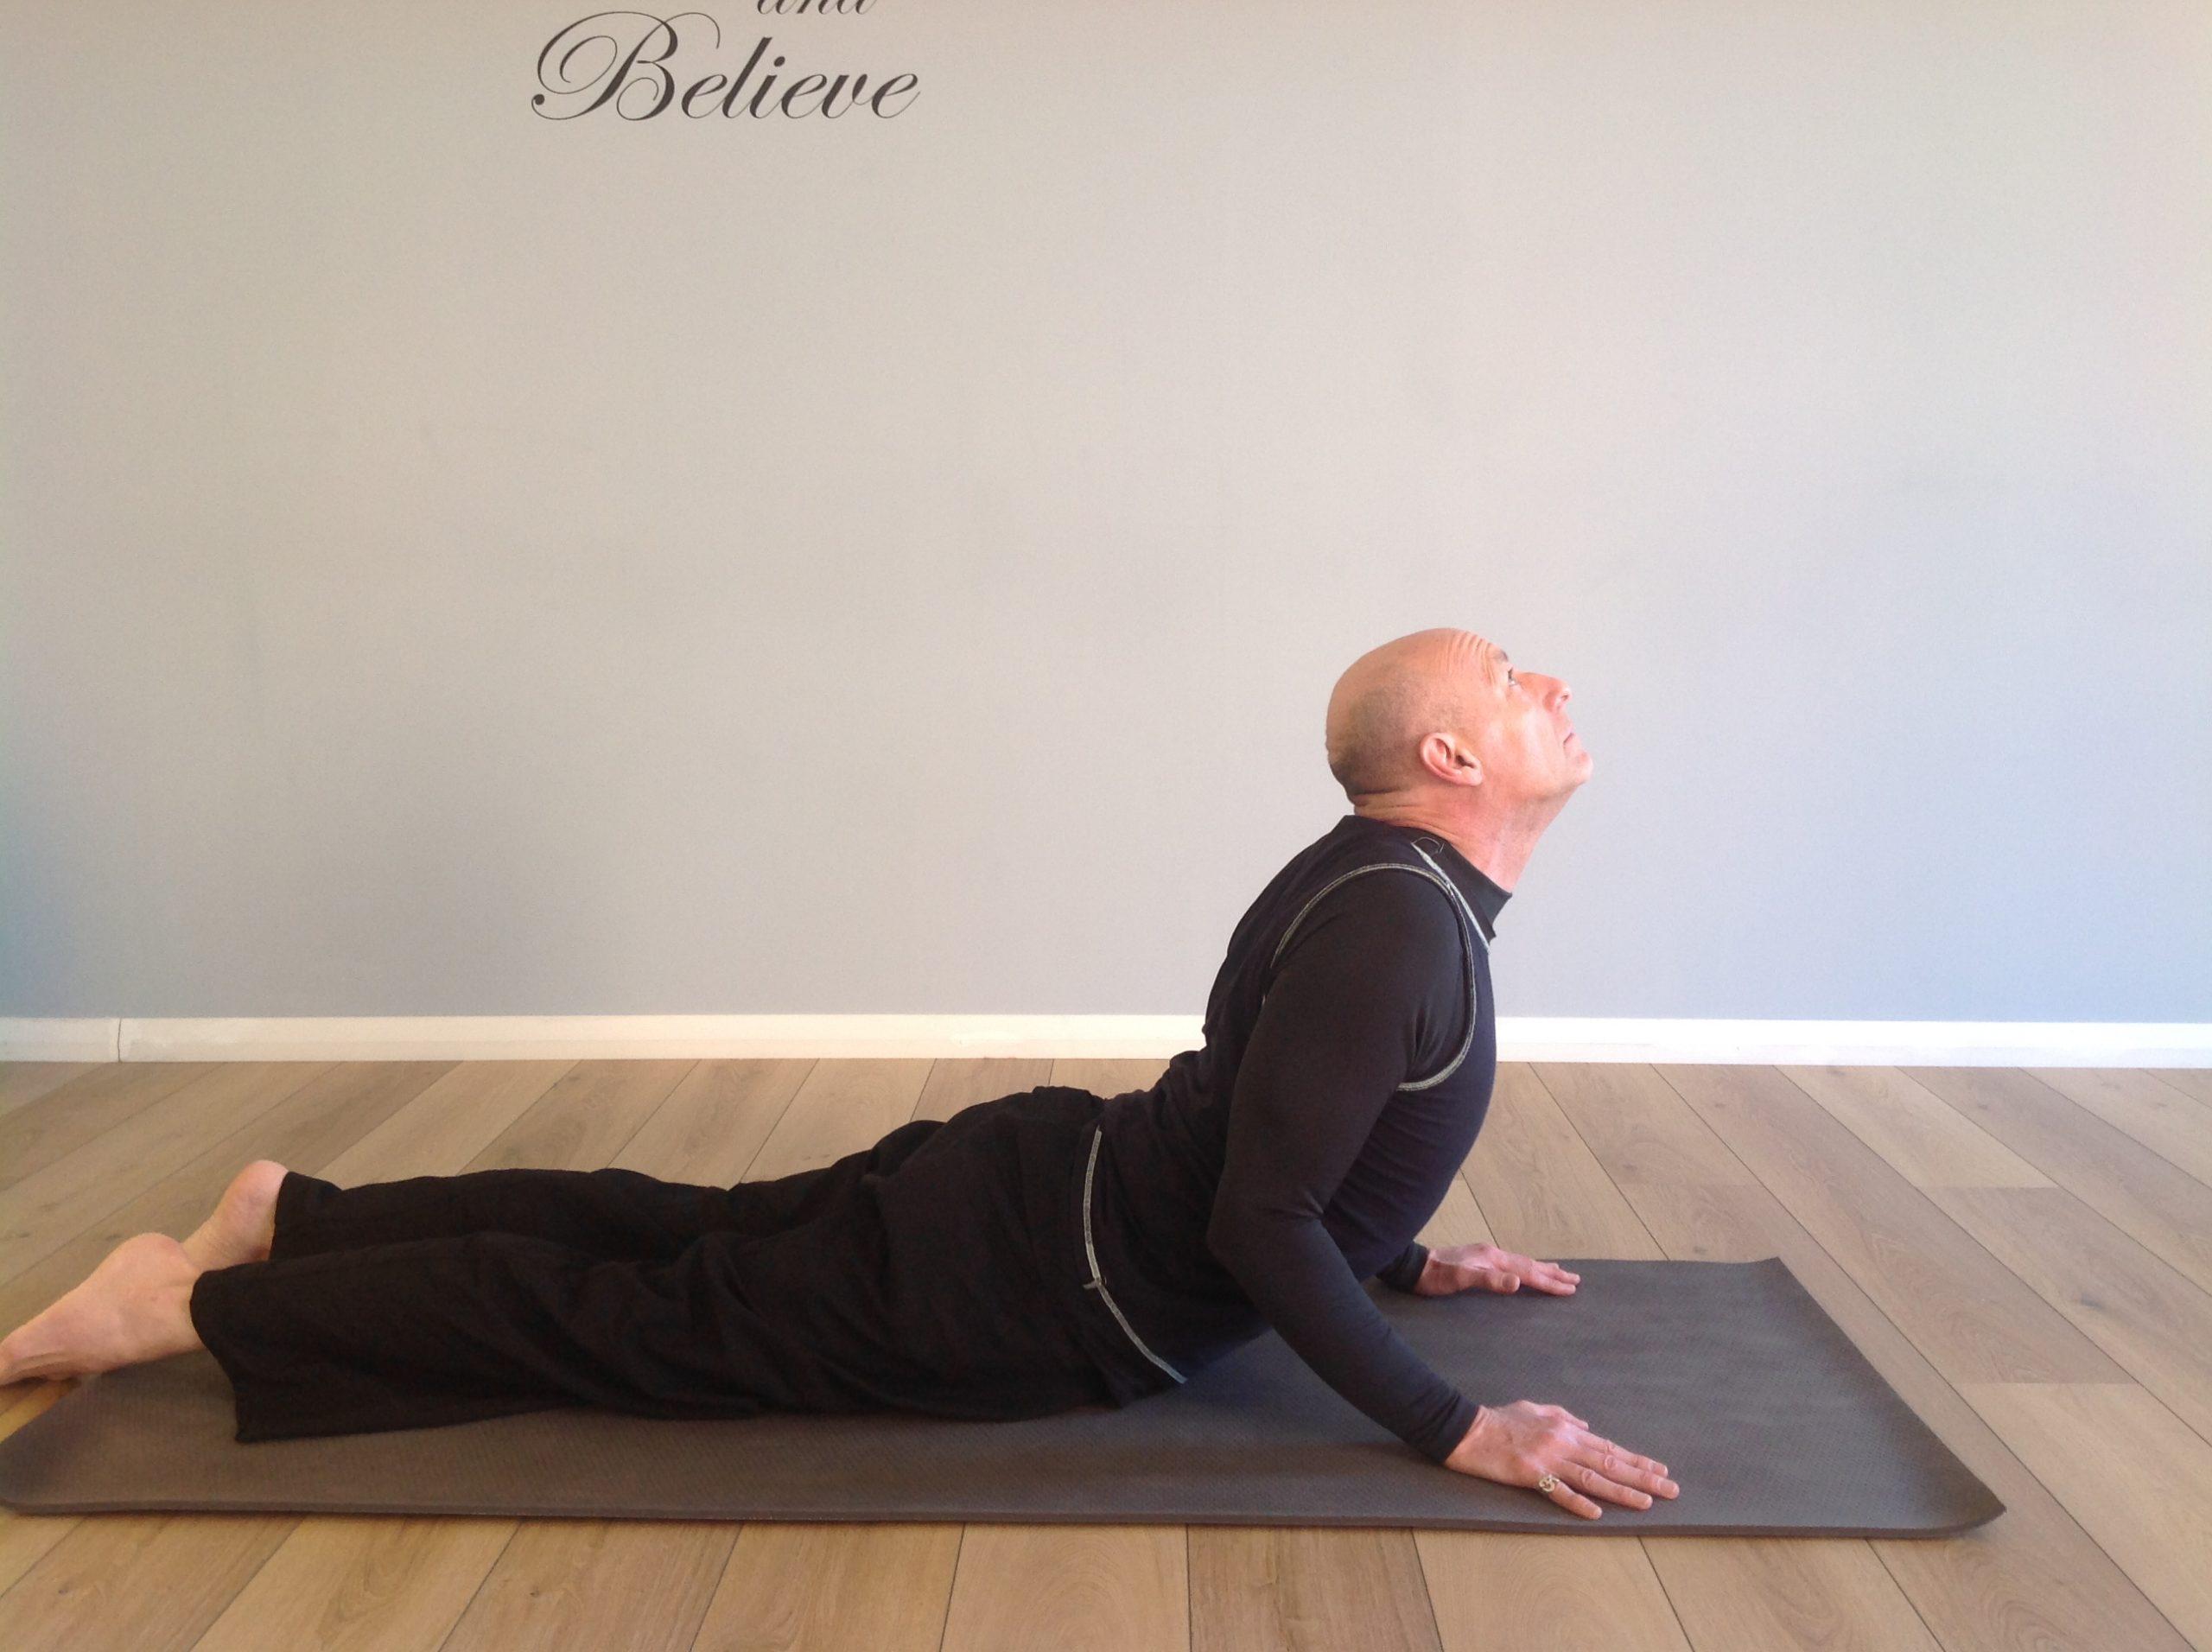 Cobra Yoga Pose